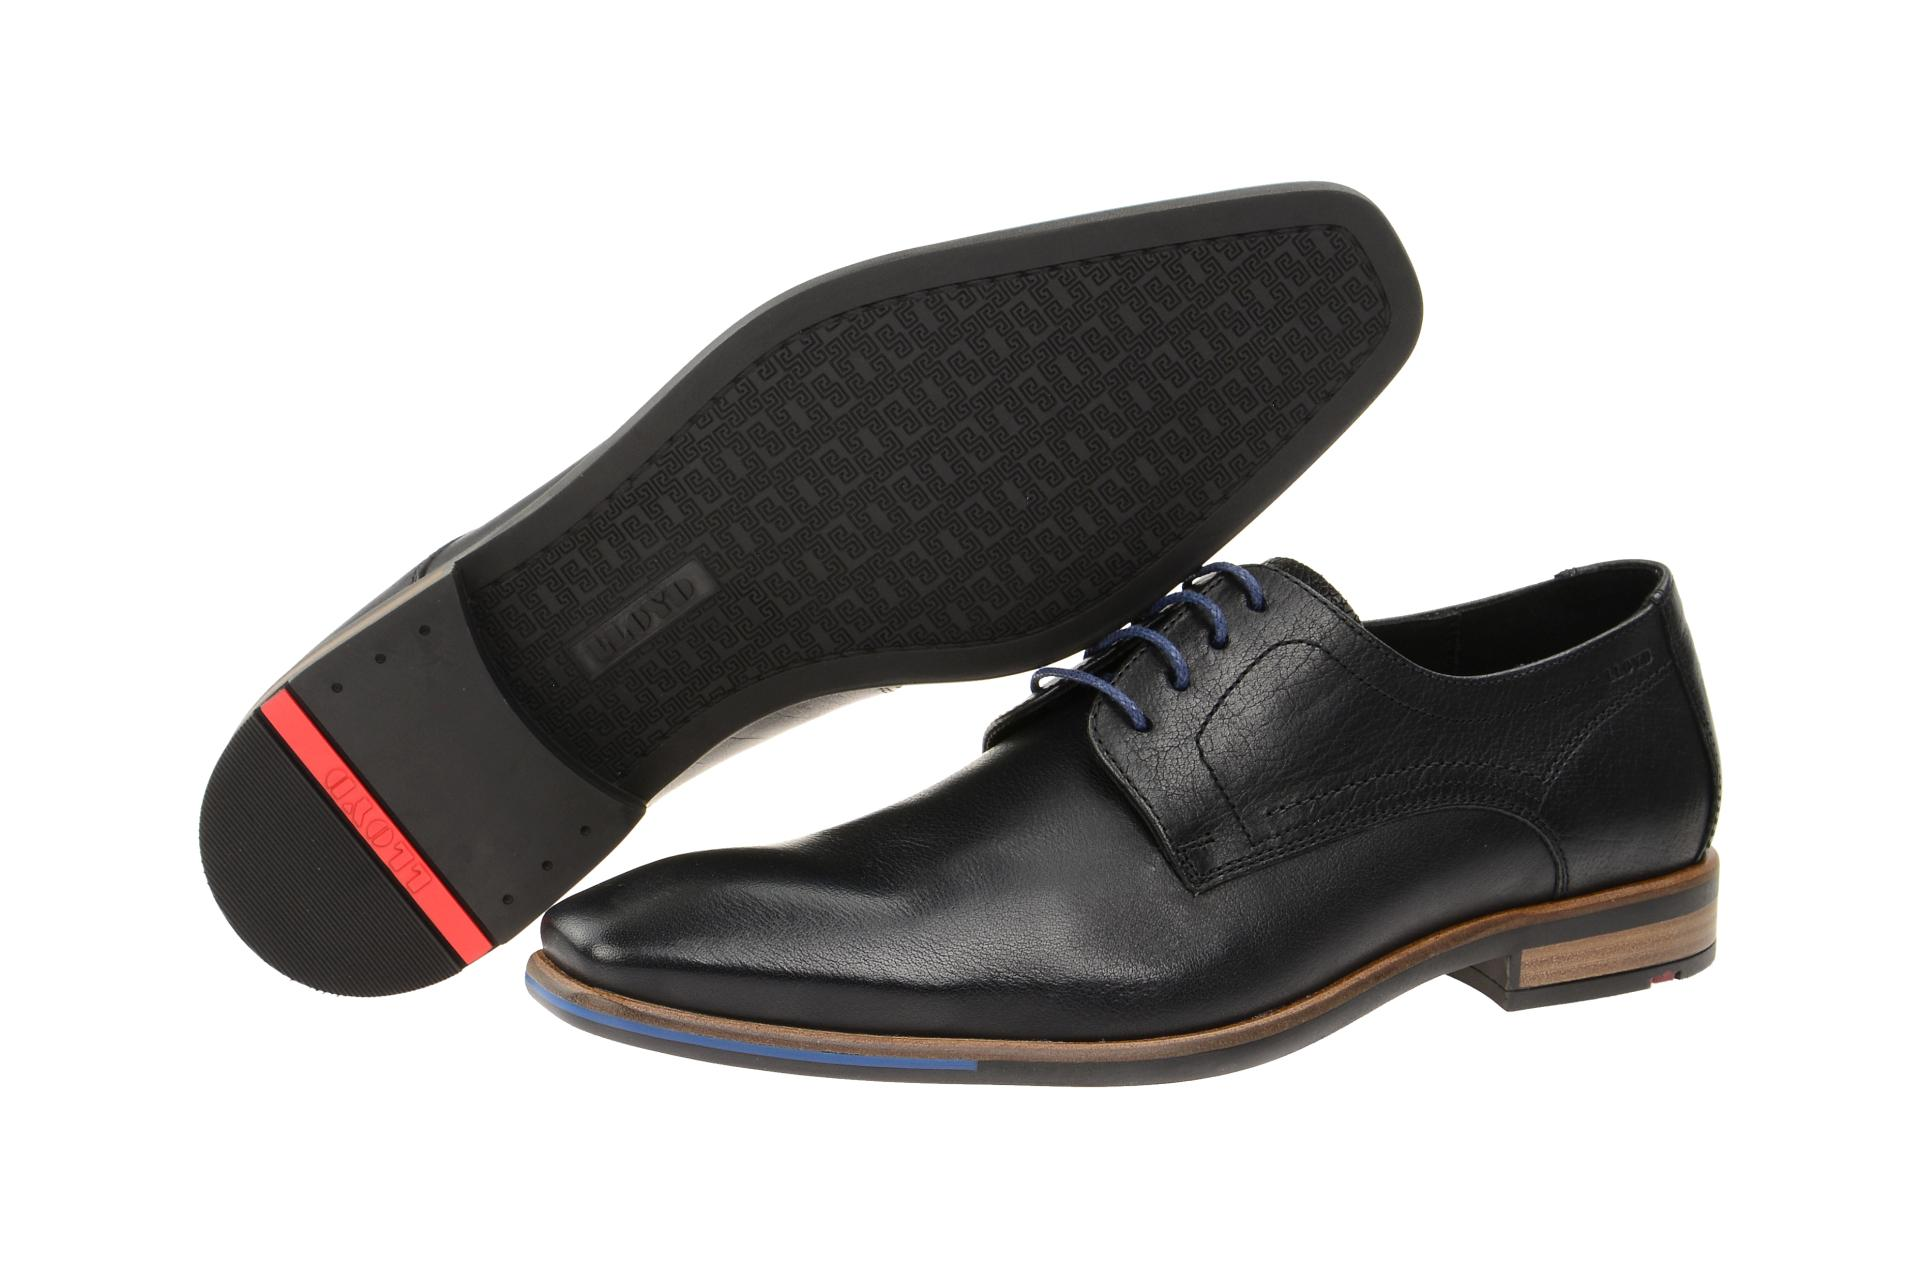 pretty nice 4f867 7cce5 Details zu LLOYD Schuhe DON schwarz 16-069-10 NEU